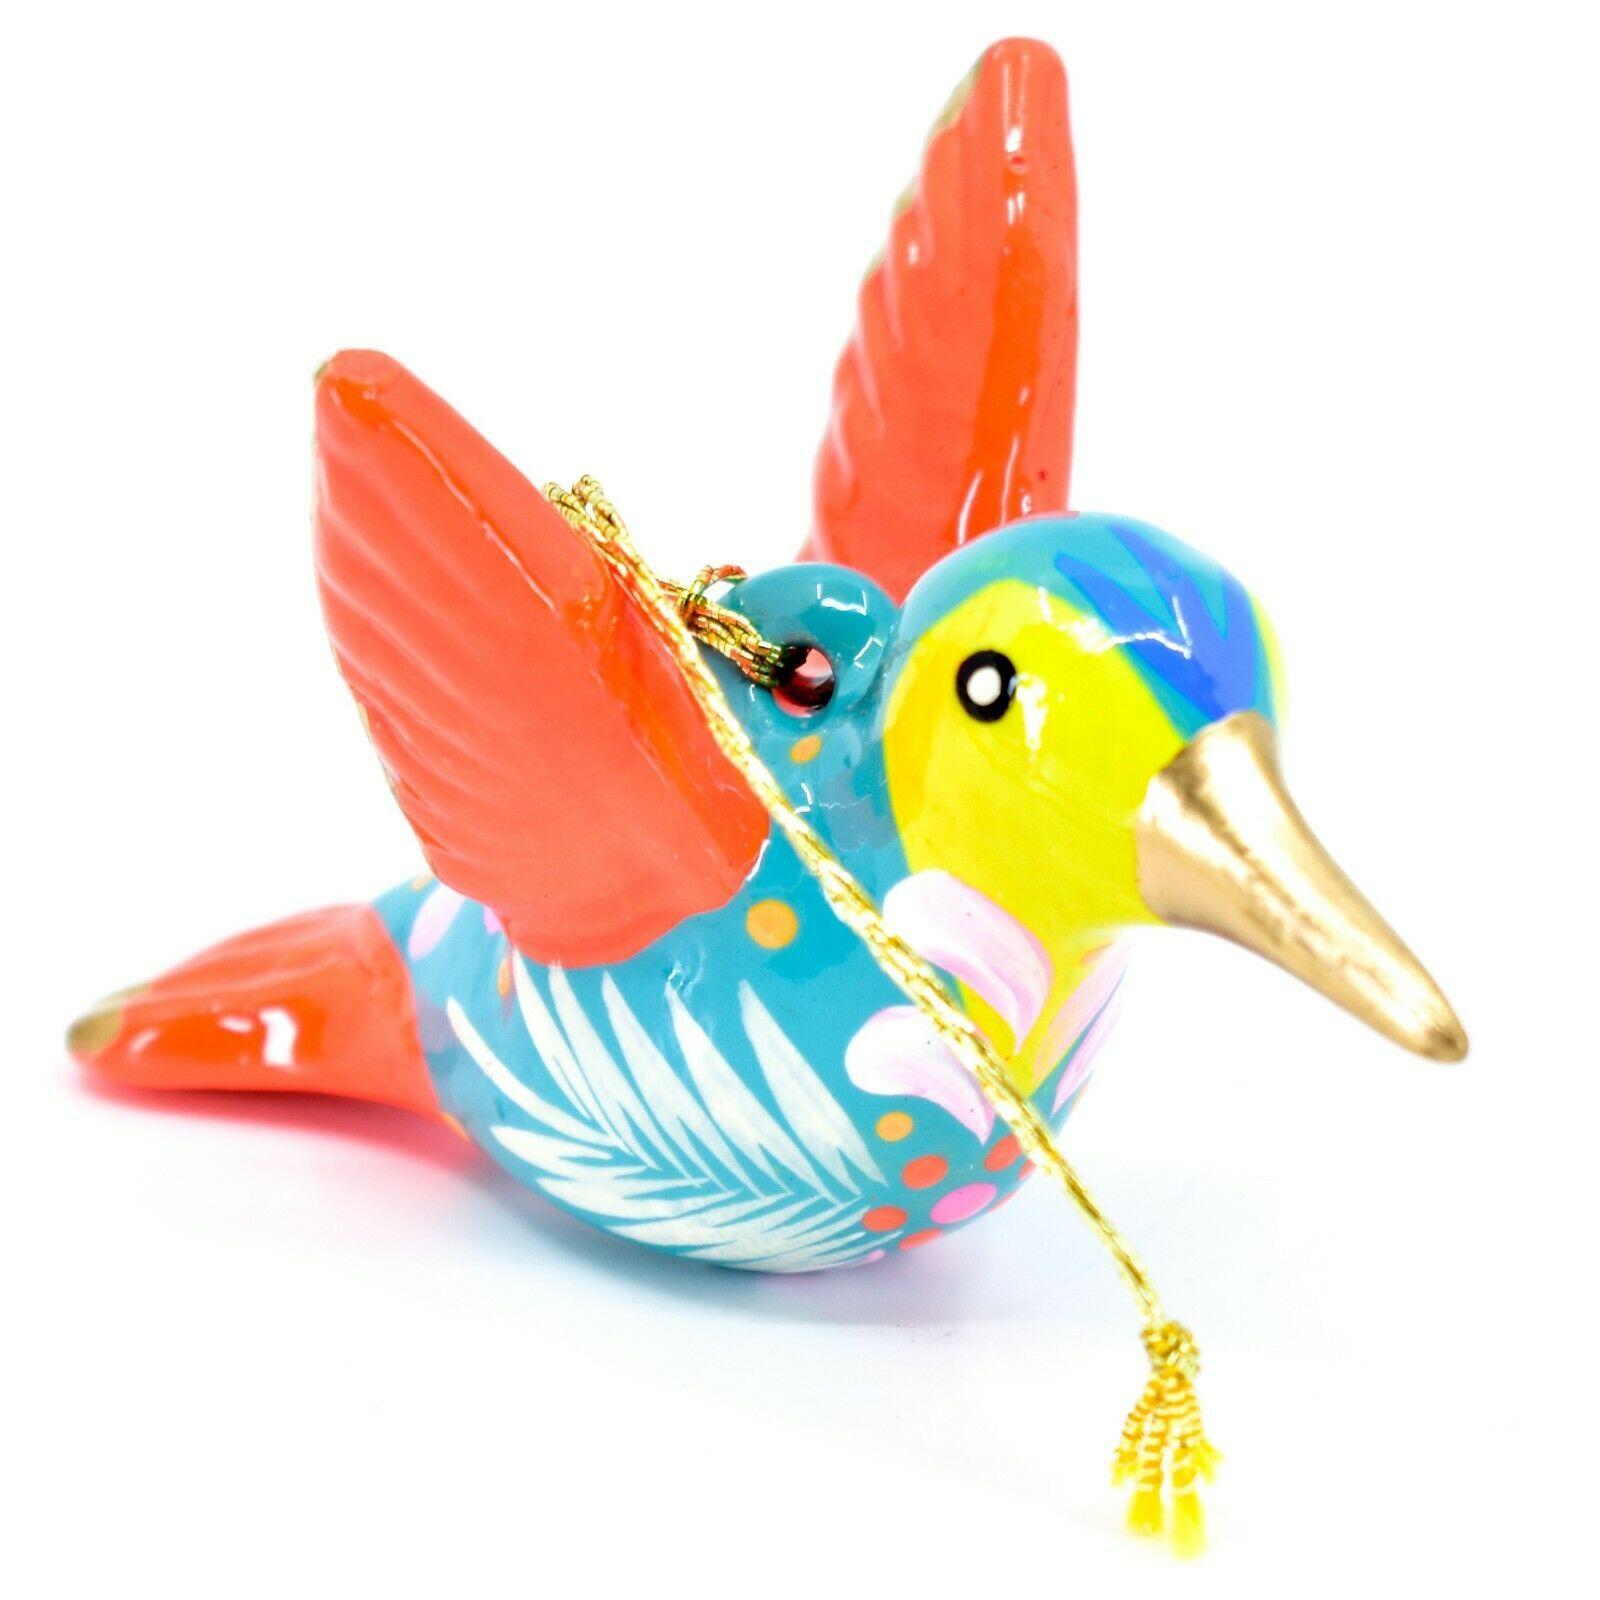 Handcrafted Painted Ceramic Blue Hummingbird Confetti Ornament Made in Peru